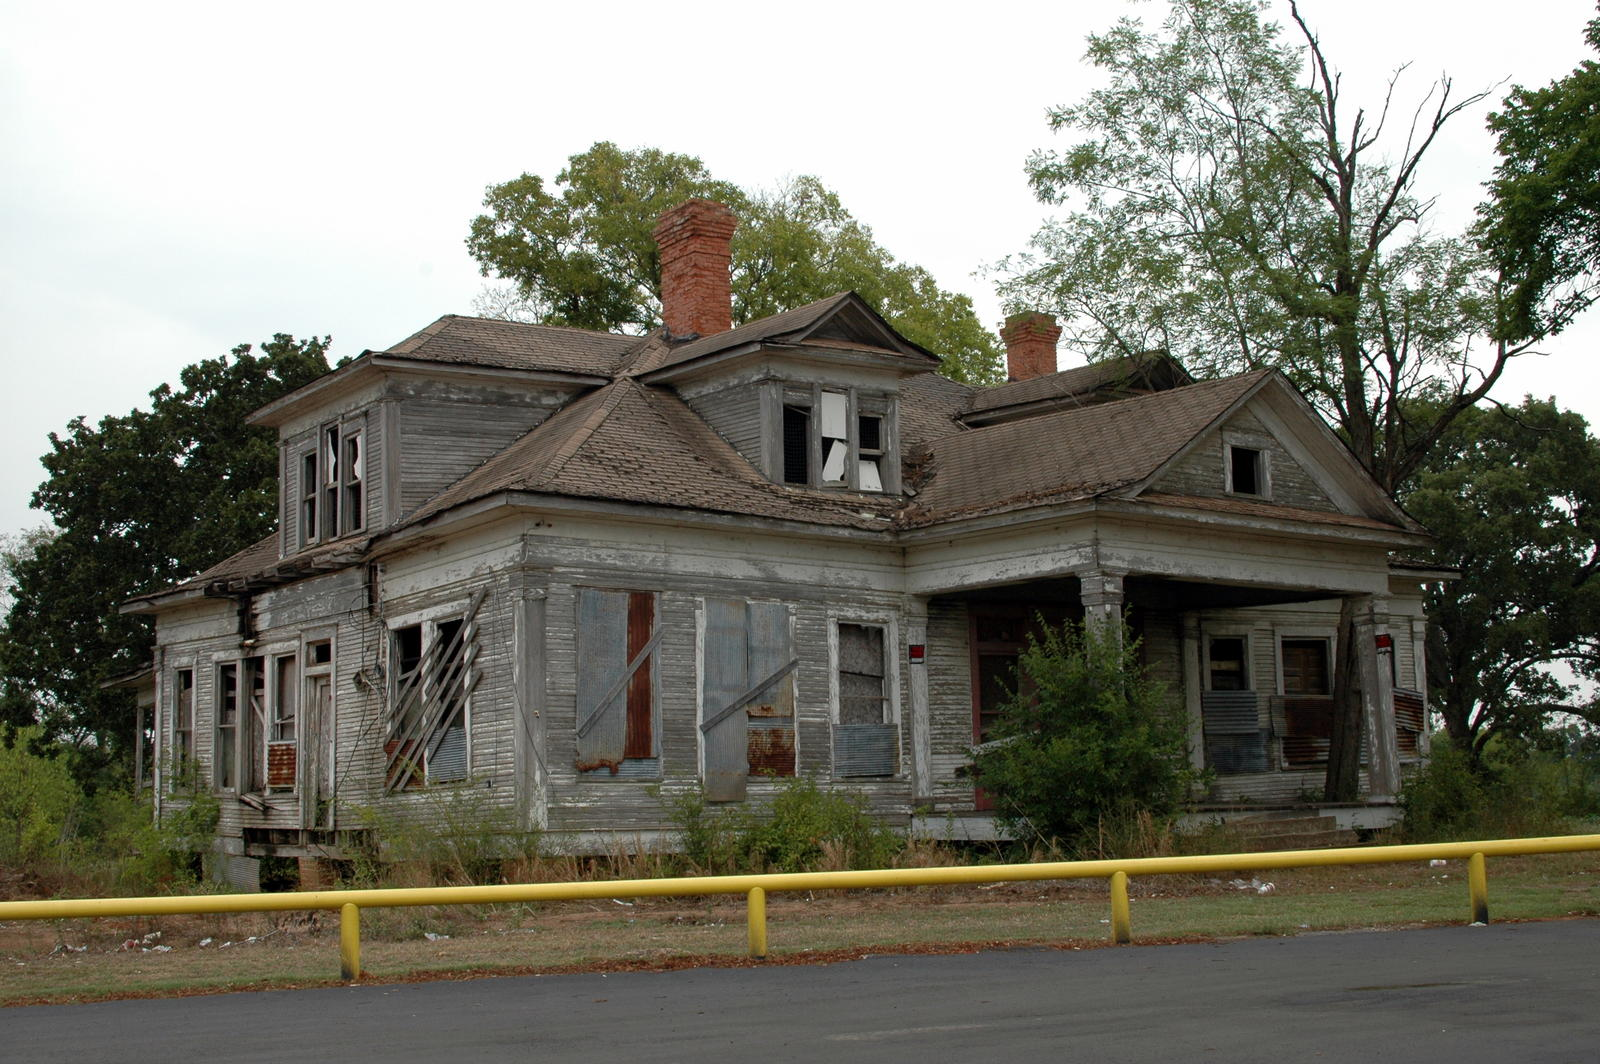 Old House 9 Old House 10 Old House 11 Old